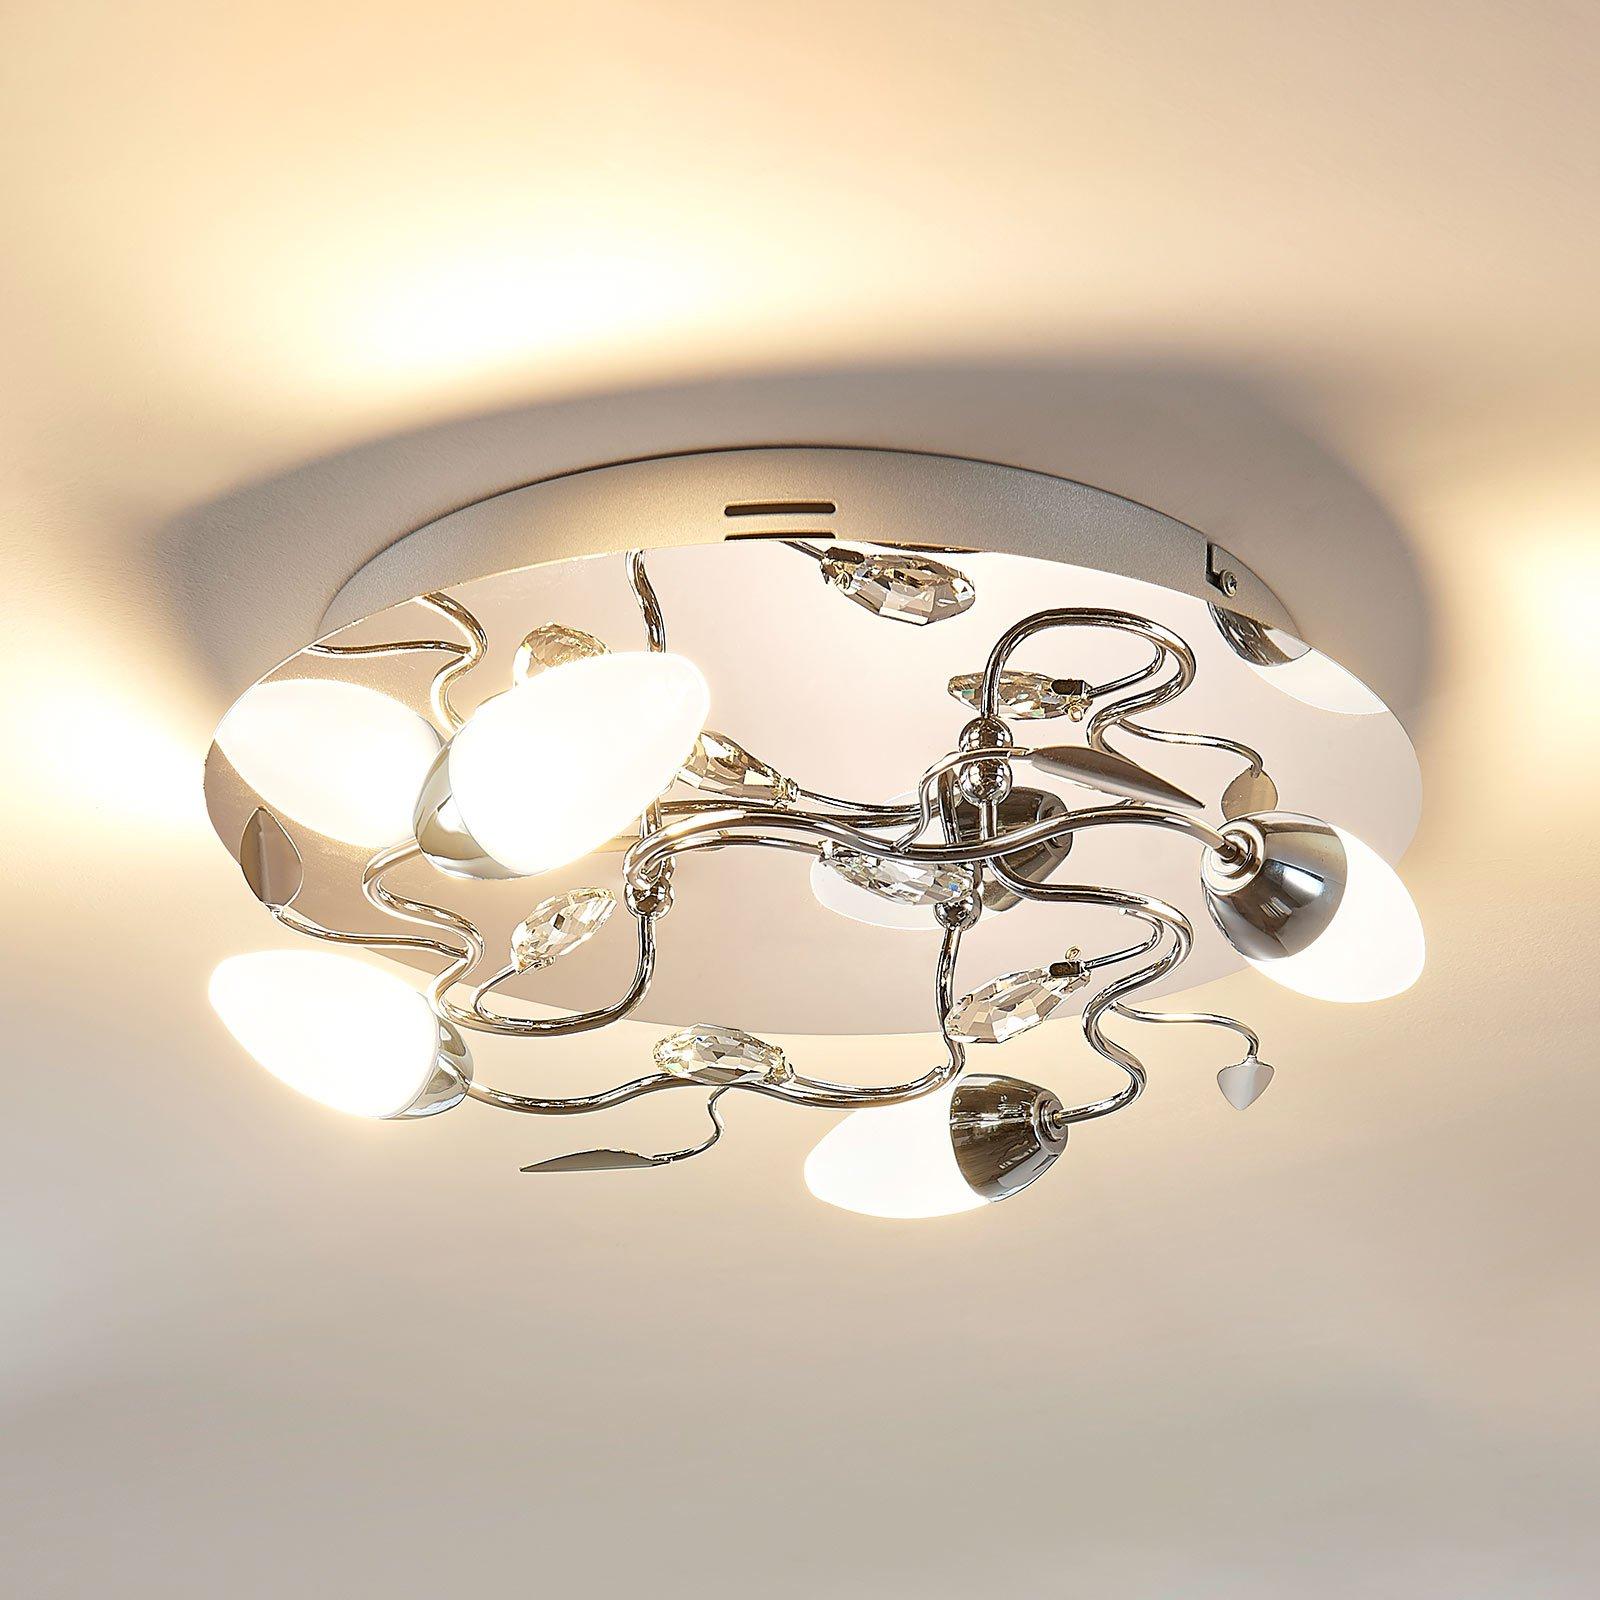 Rund LED-taklampe Mischa, dimbar i 3 trinn